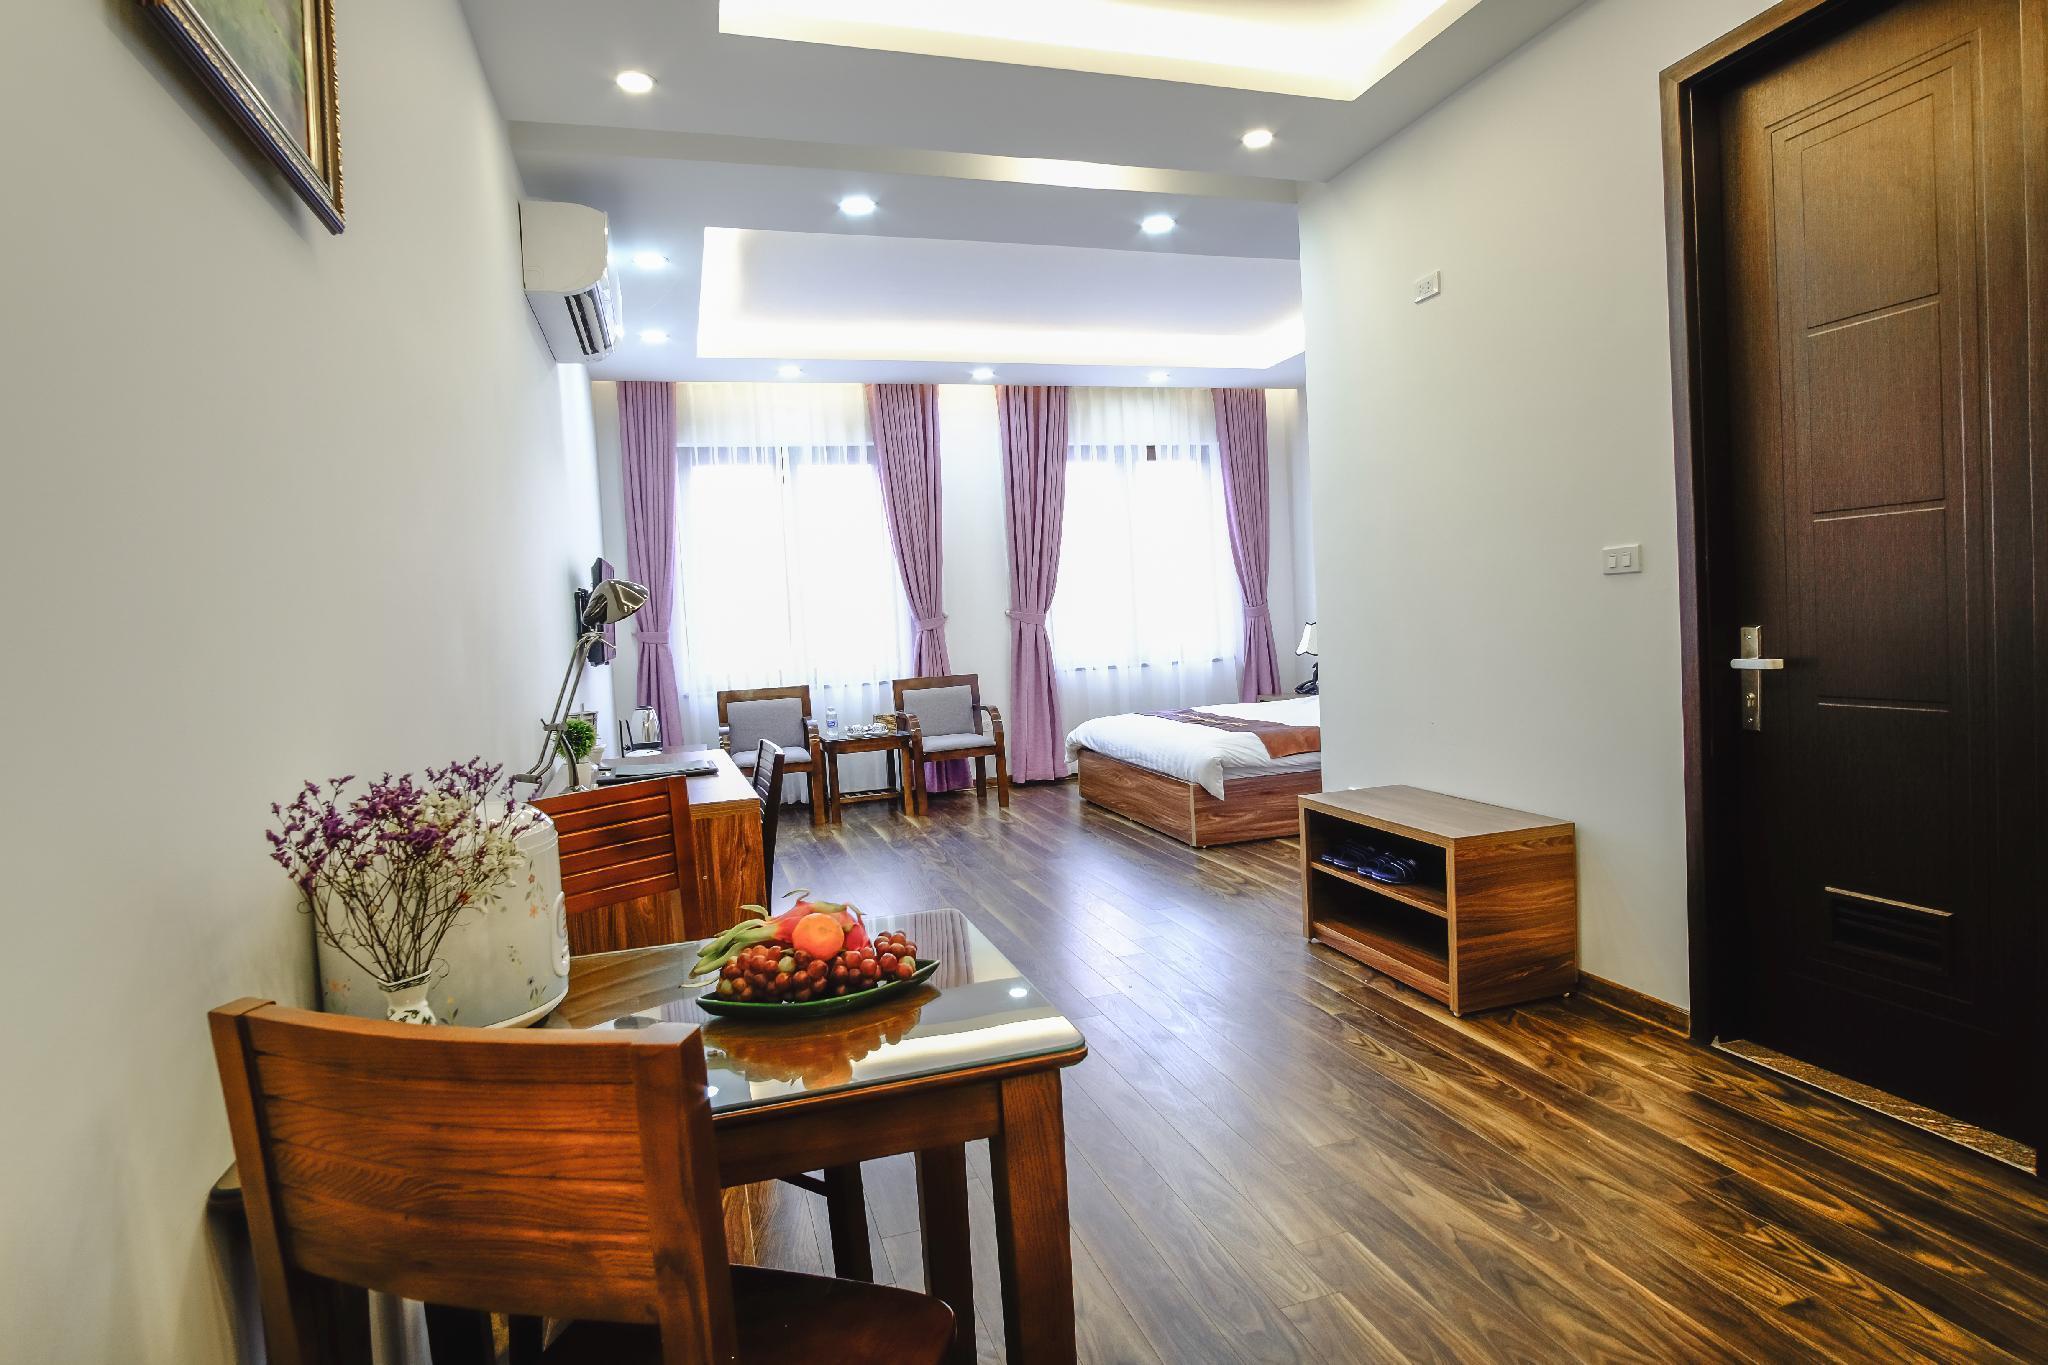 Sammy Luxury Hotel, Ba Đình